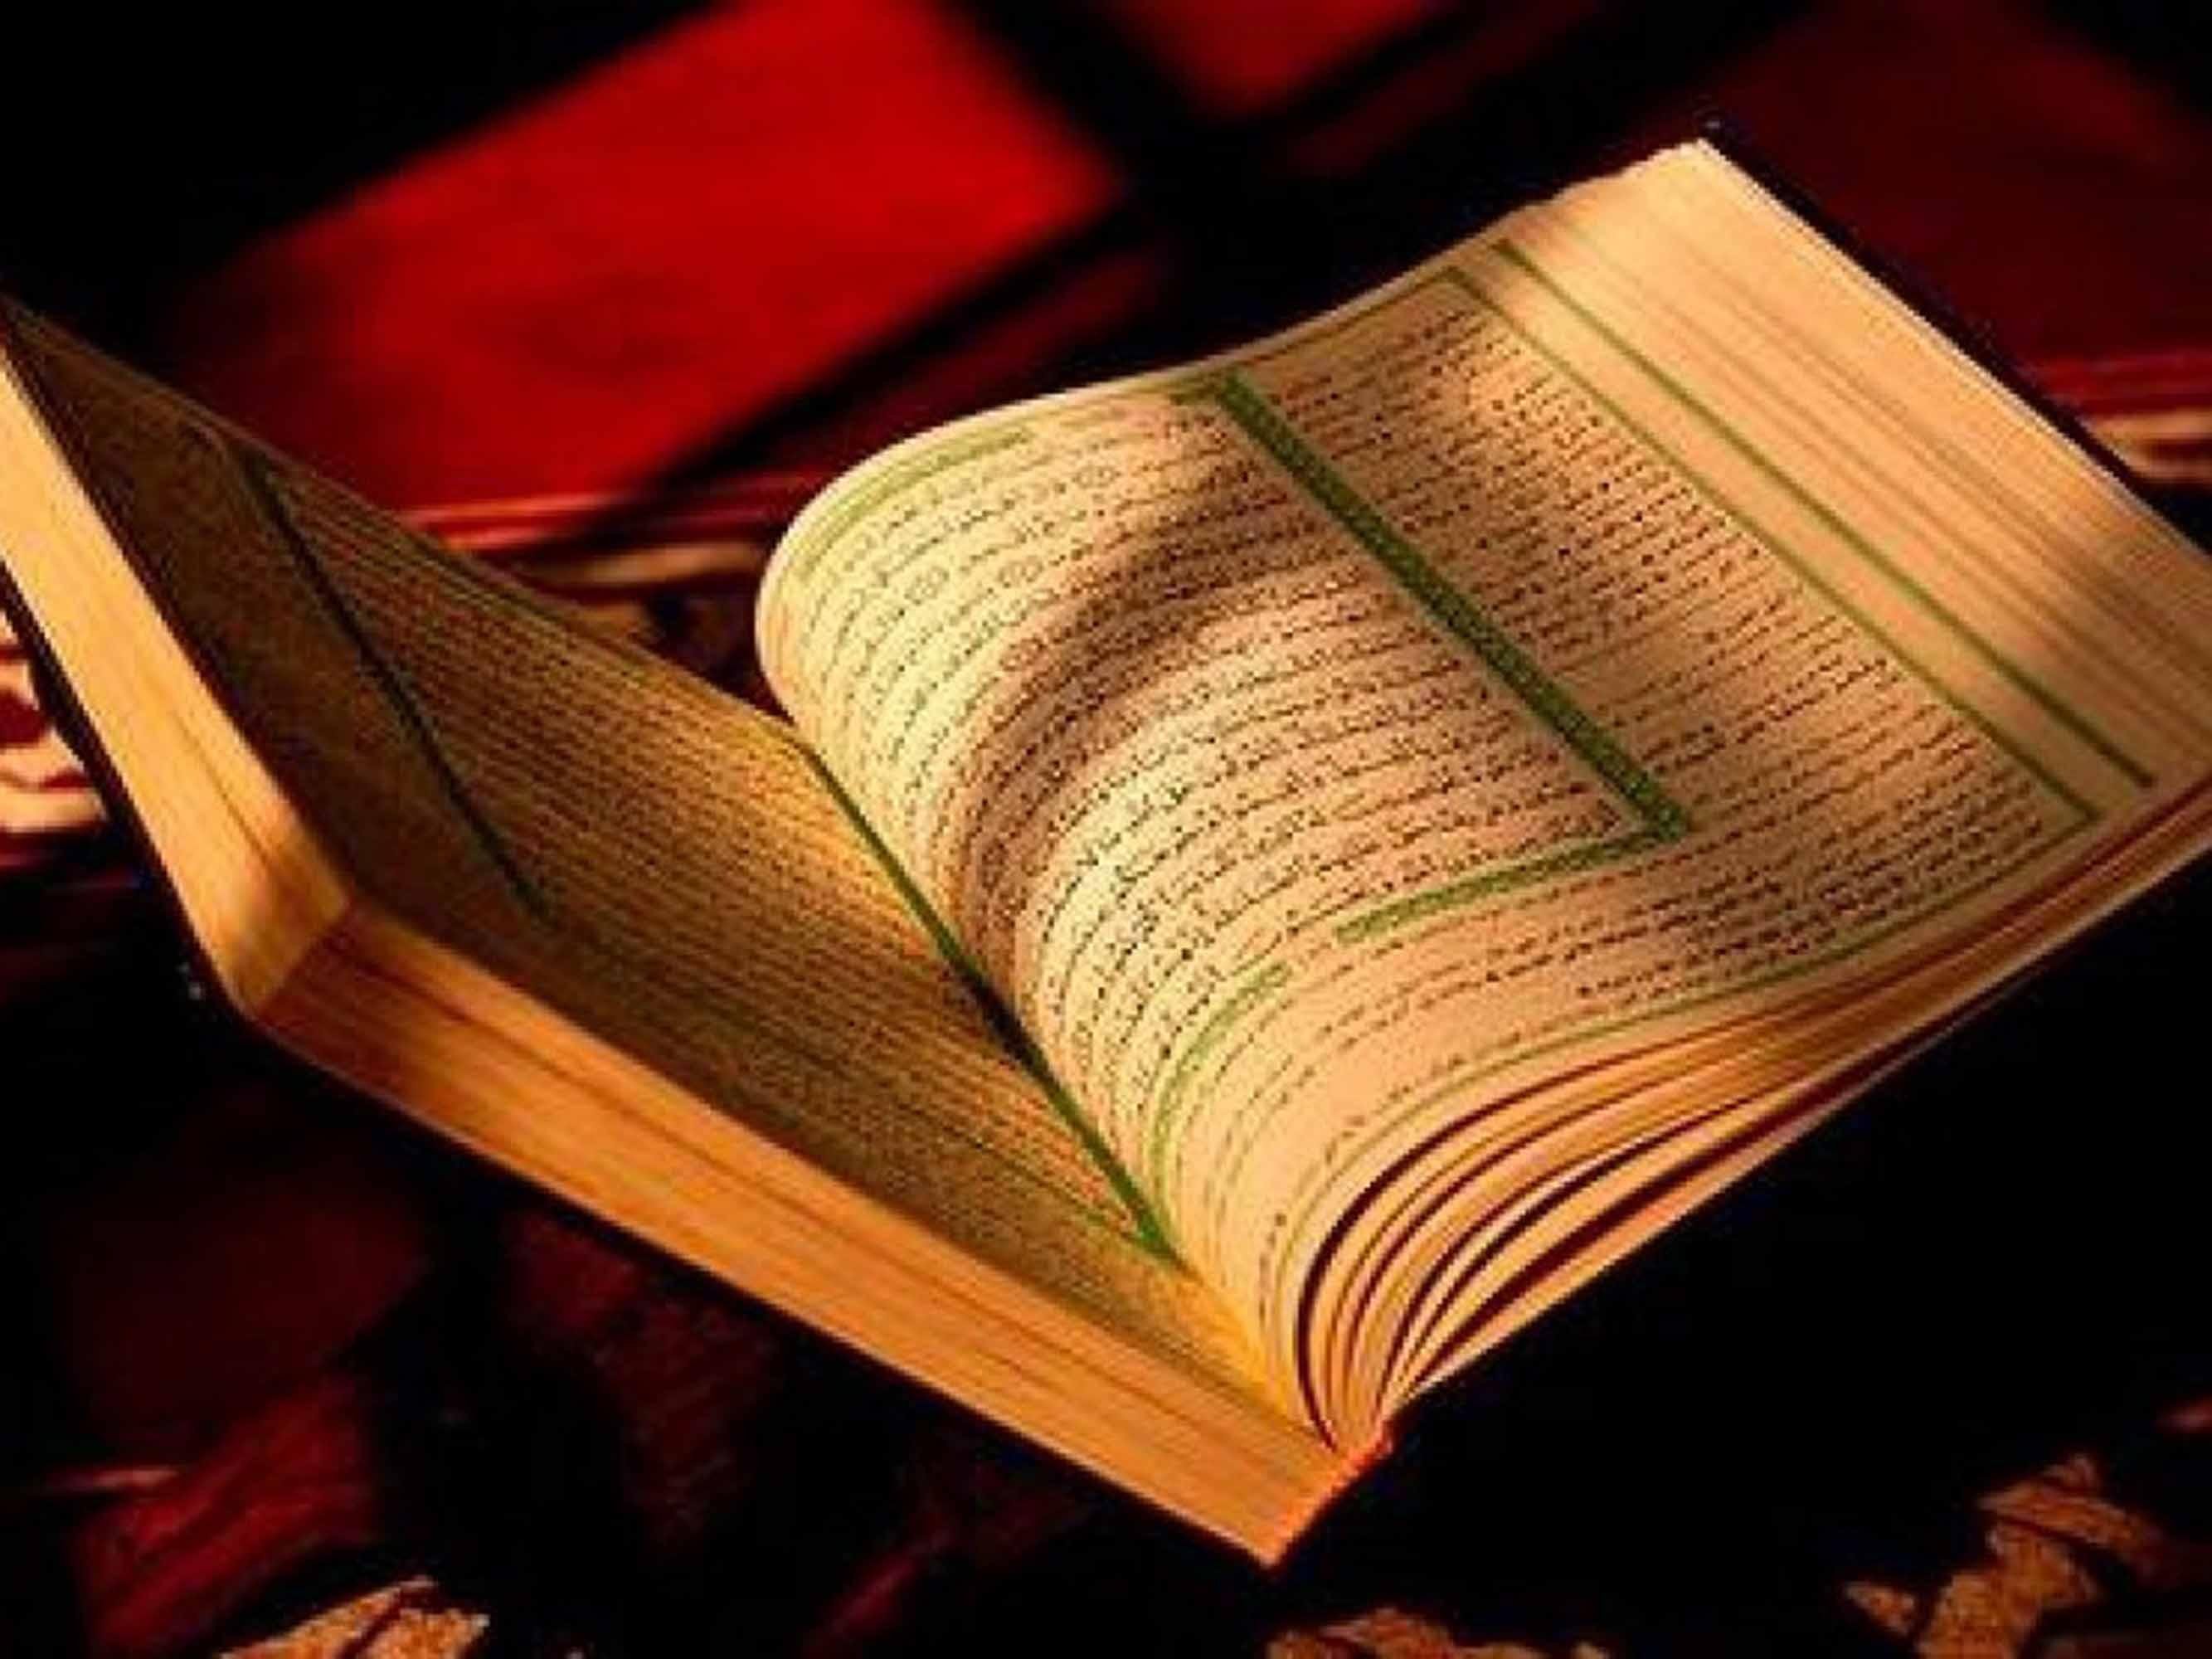 Kementrian Agama Rilis Al-Quran Dengan Terjemahan 9 Bahasa Daerah